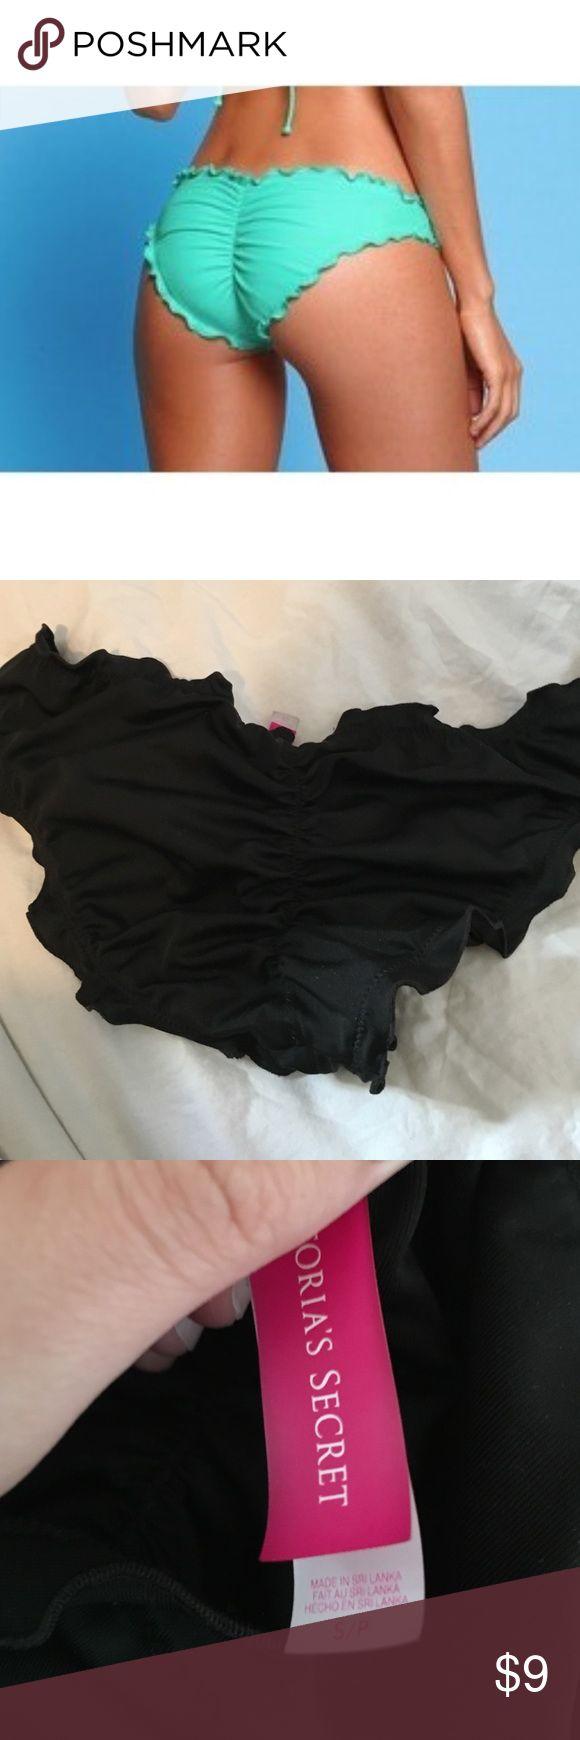 Victoria's secret black ruched bikini bottom Great condition, no pilling! Victoria's Secret Swim Bikinis